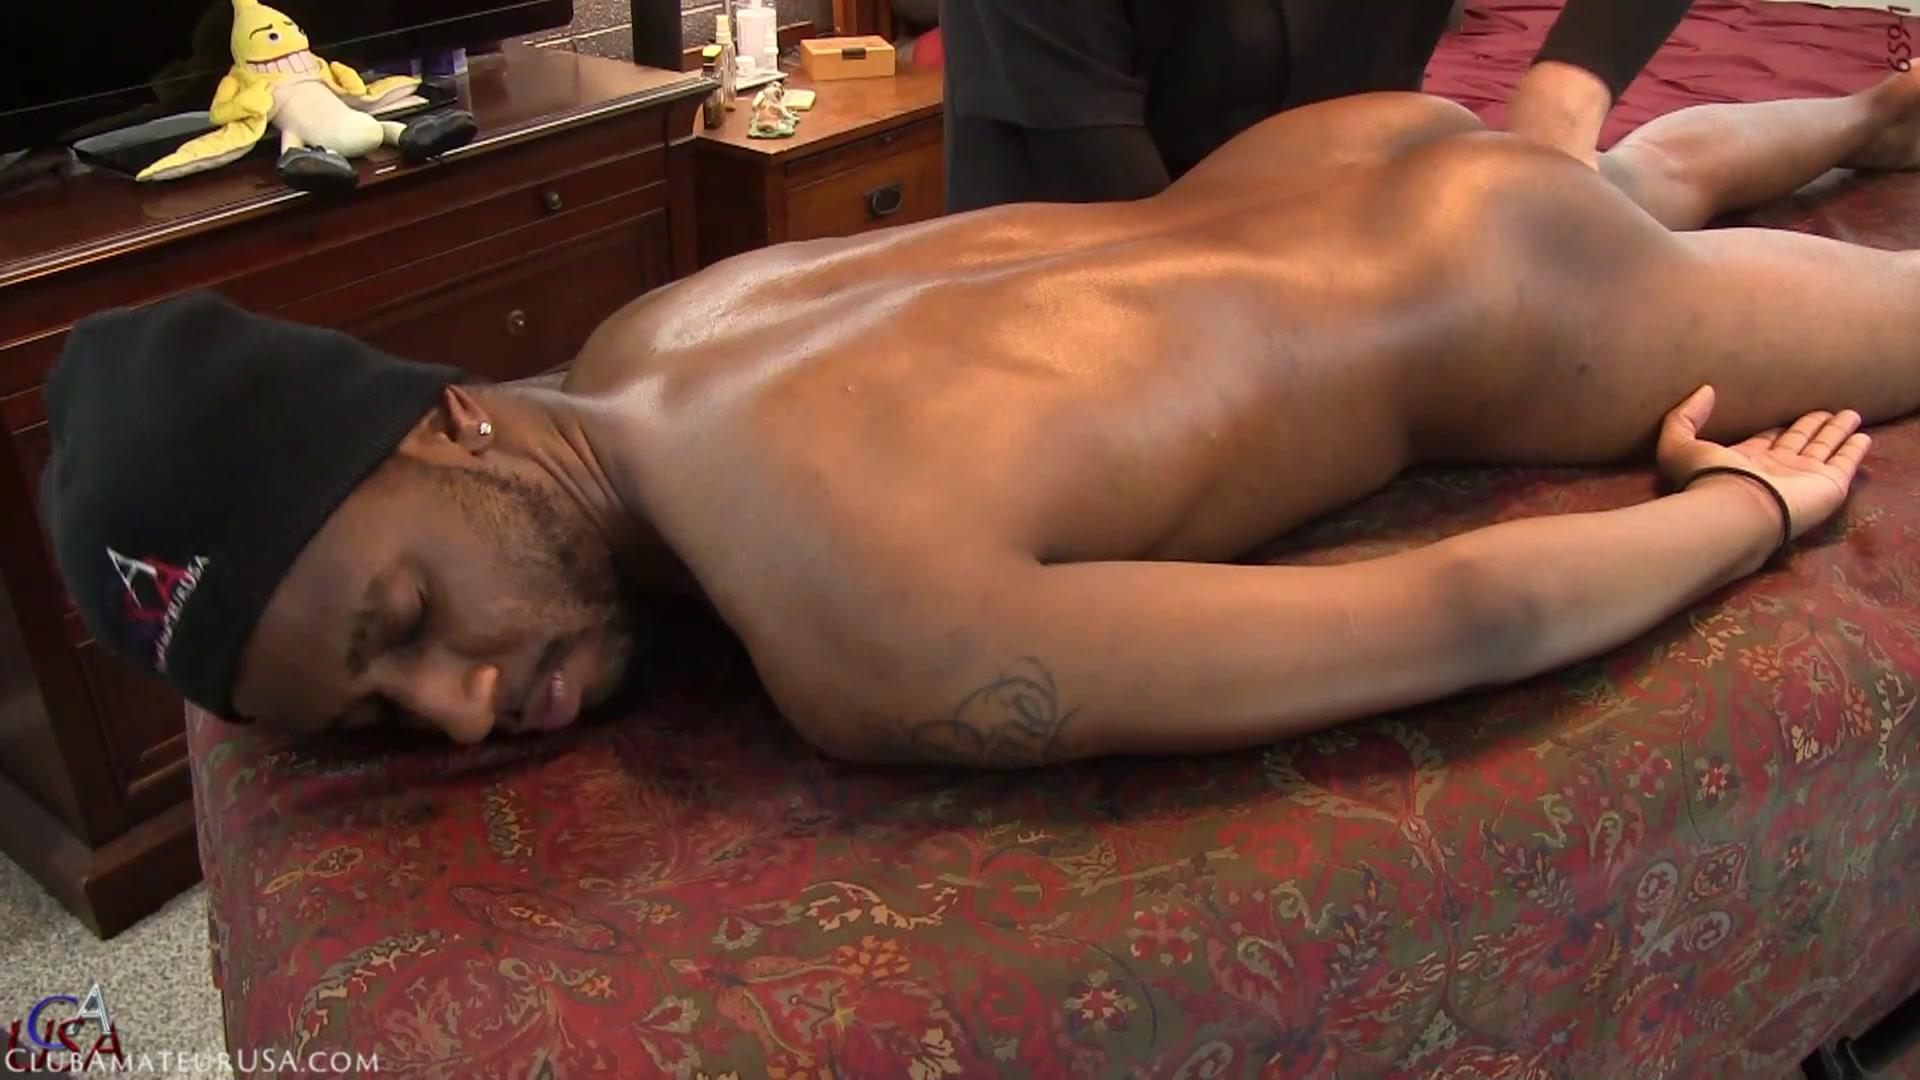 CAUSA 659 Jonah - 1 of 2 - ClubAmateurUSA naked and making love